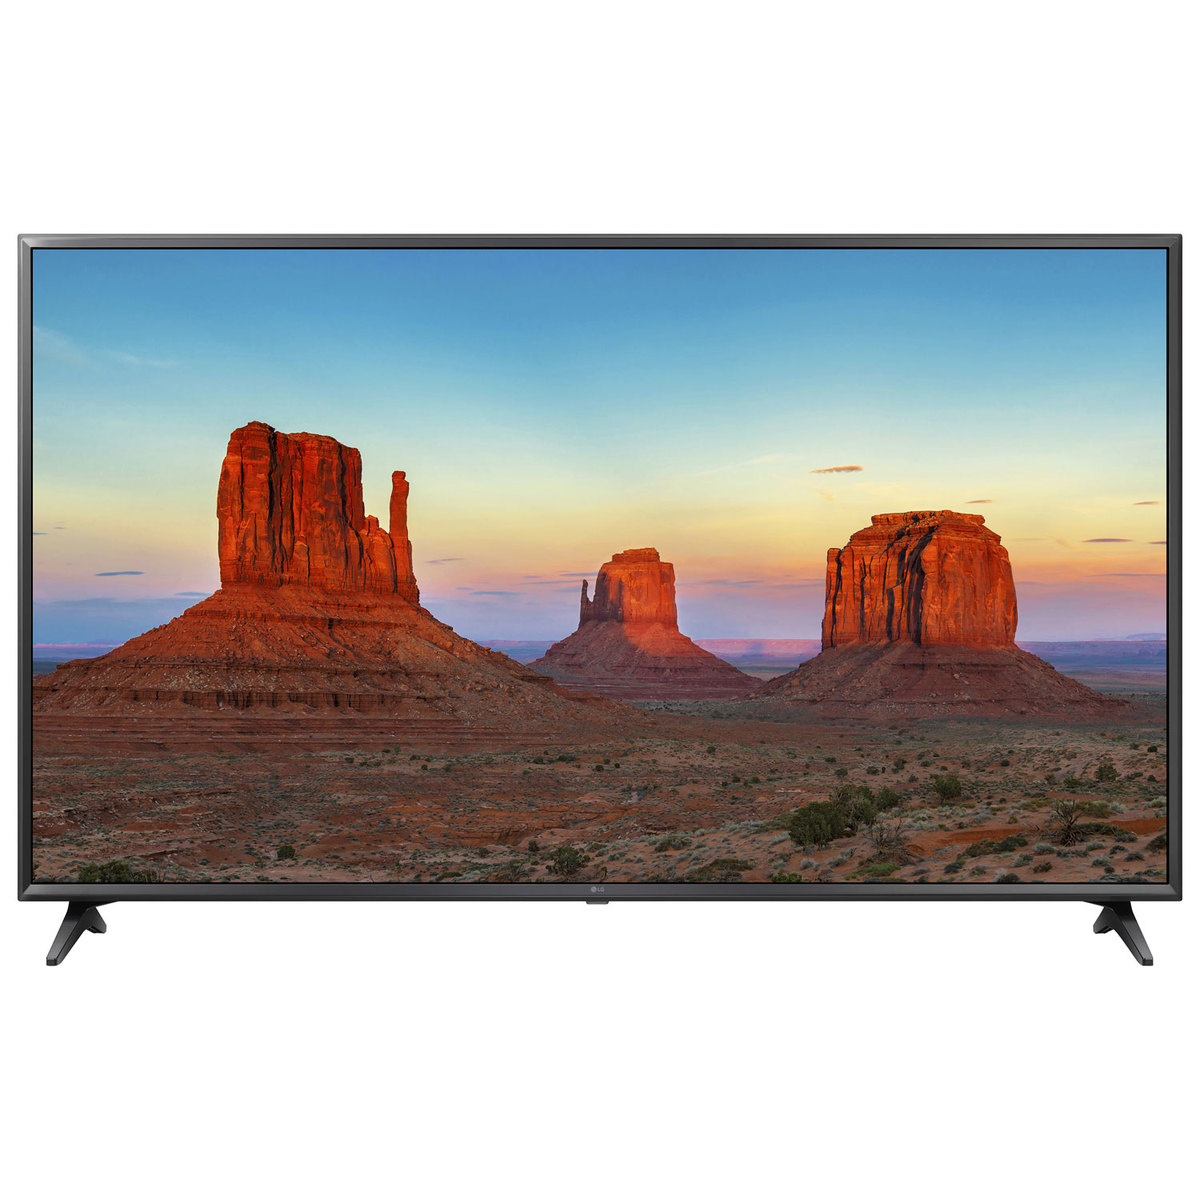 טלוויזיה LG 65UK6300Y 4K 65 אינטש